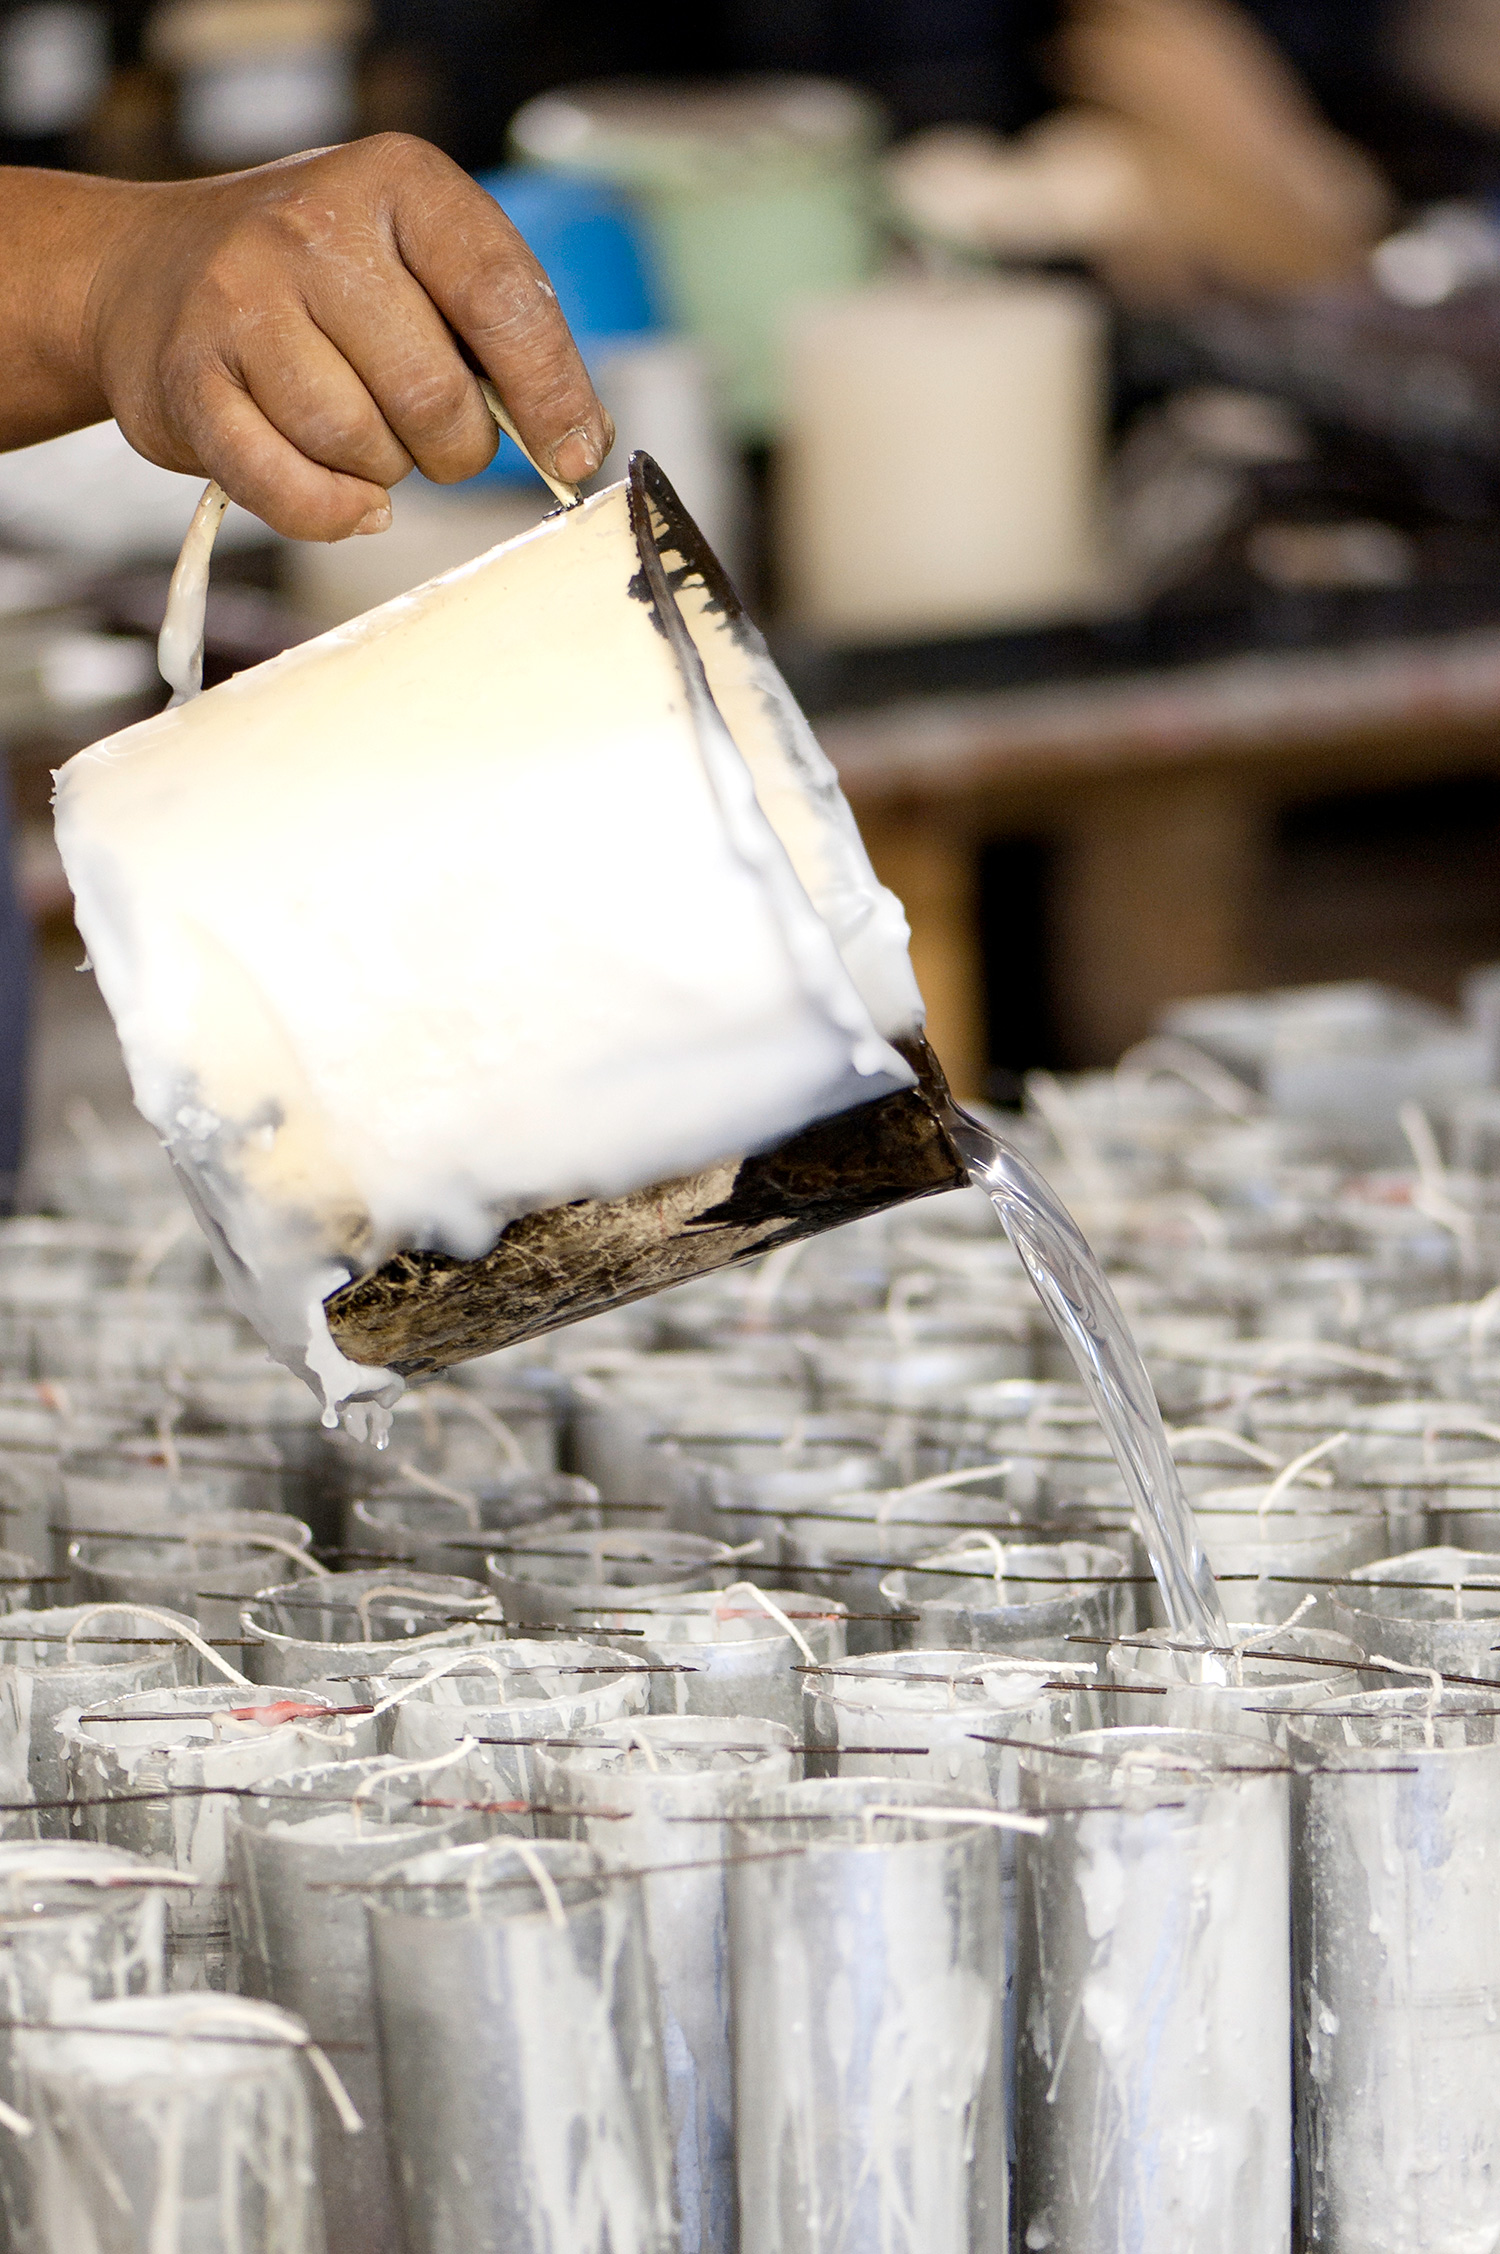 kapula-handmade-premium-fragranced-candles-wax-pouring-manufacturer.jpg